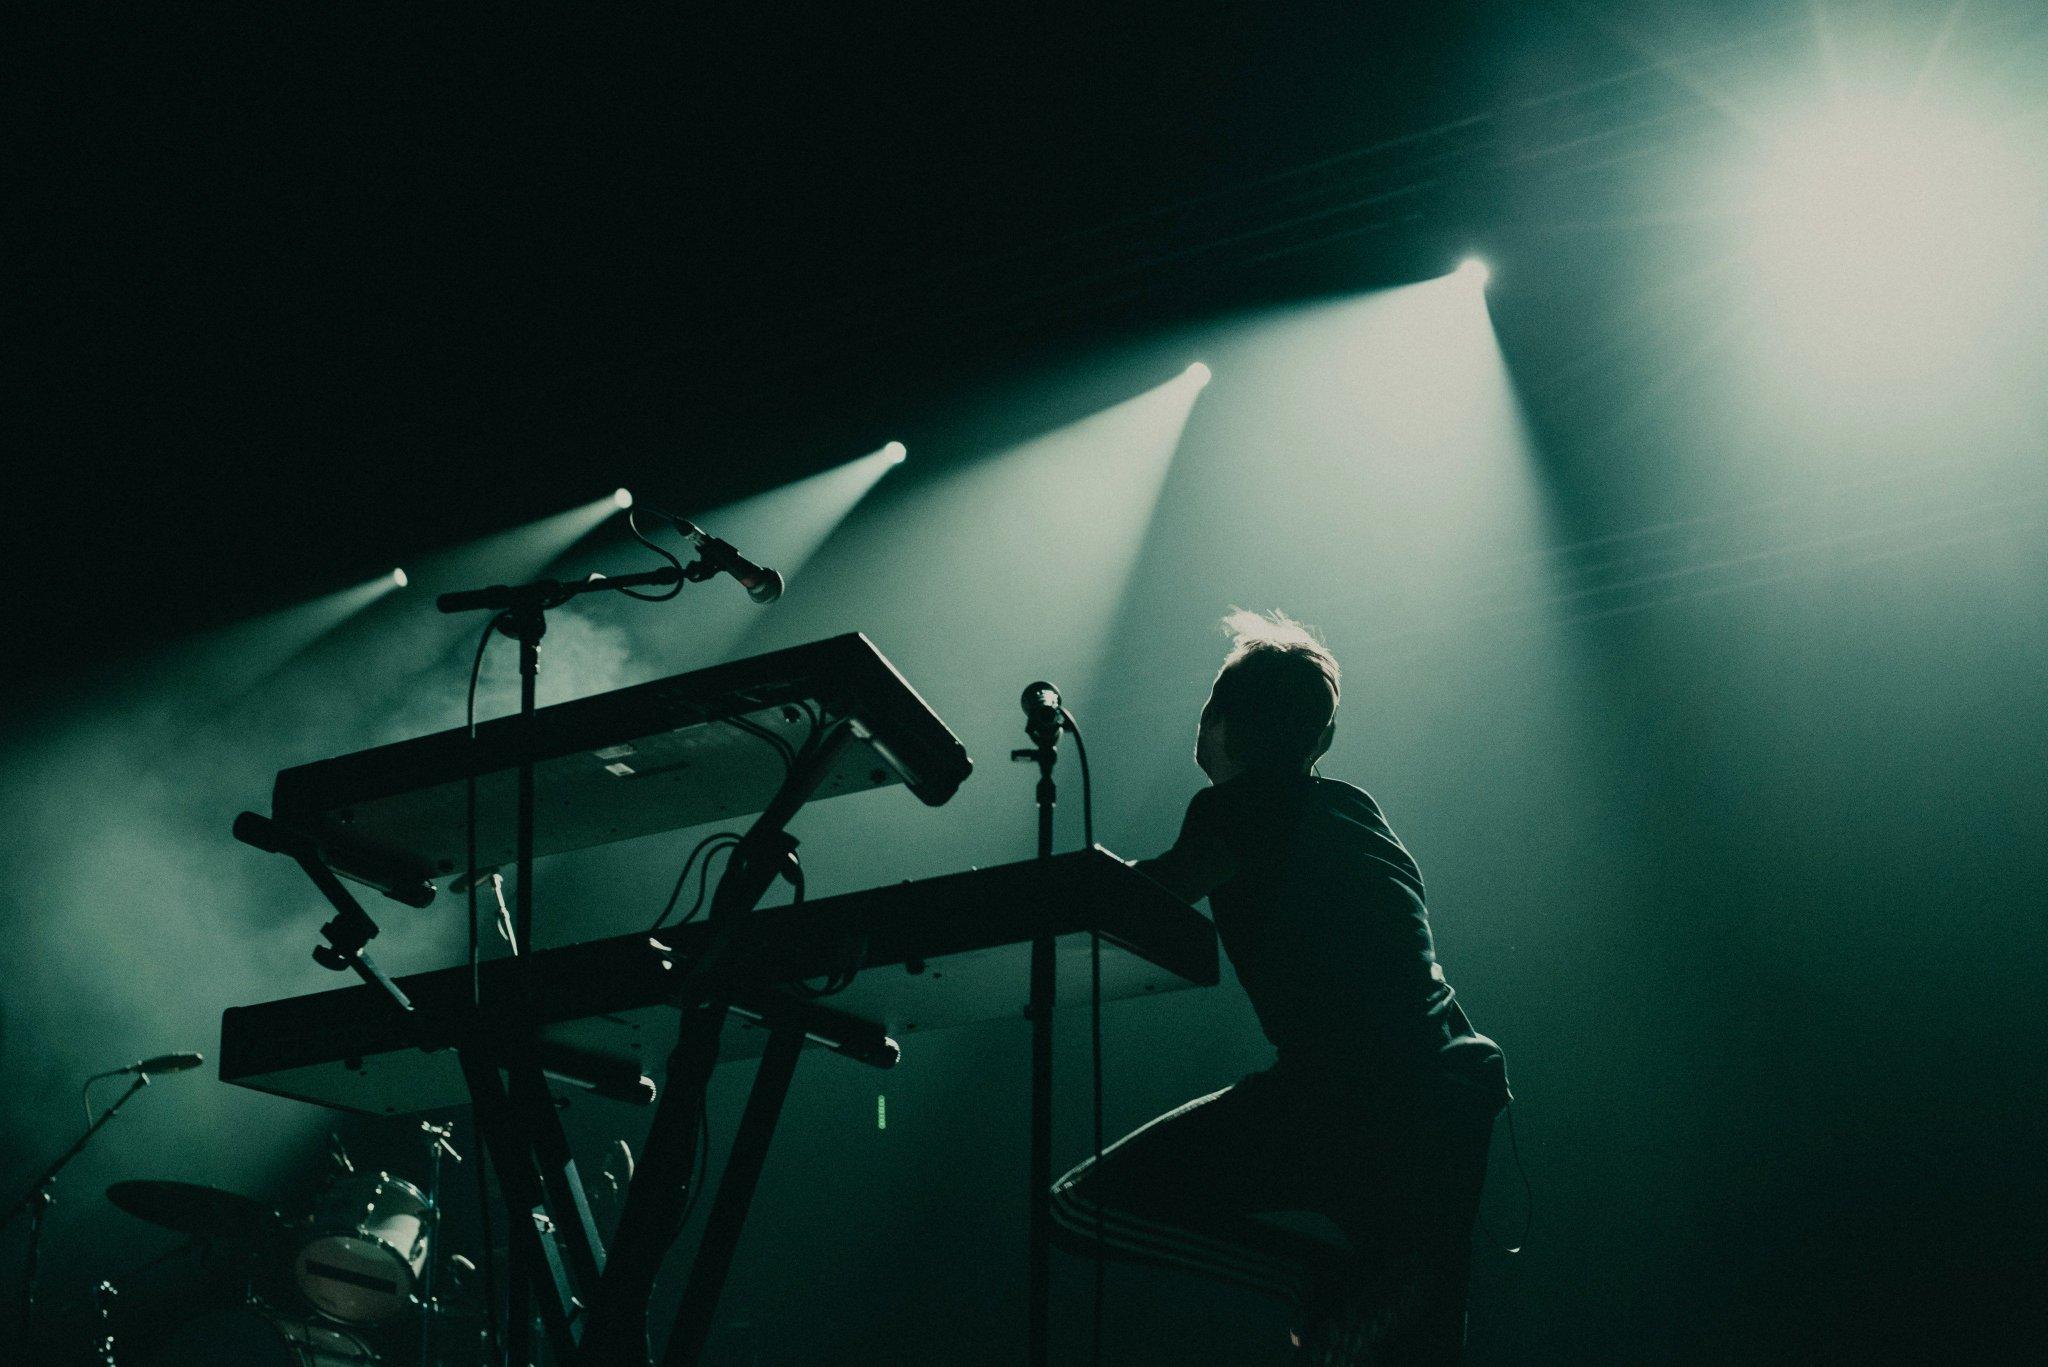 .@XAmbassadors performing live at @volapalooza in Knoxville. Photos by @nolanknight_. https://t.co/4LtSvywyJu